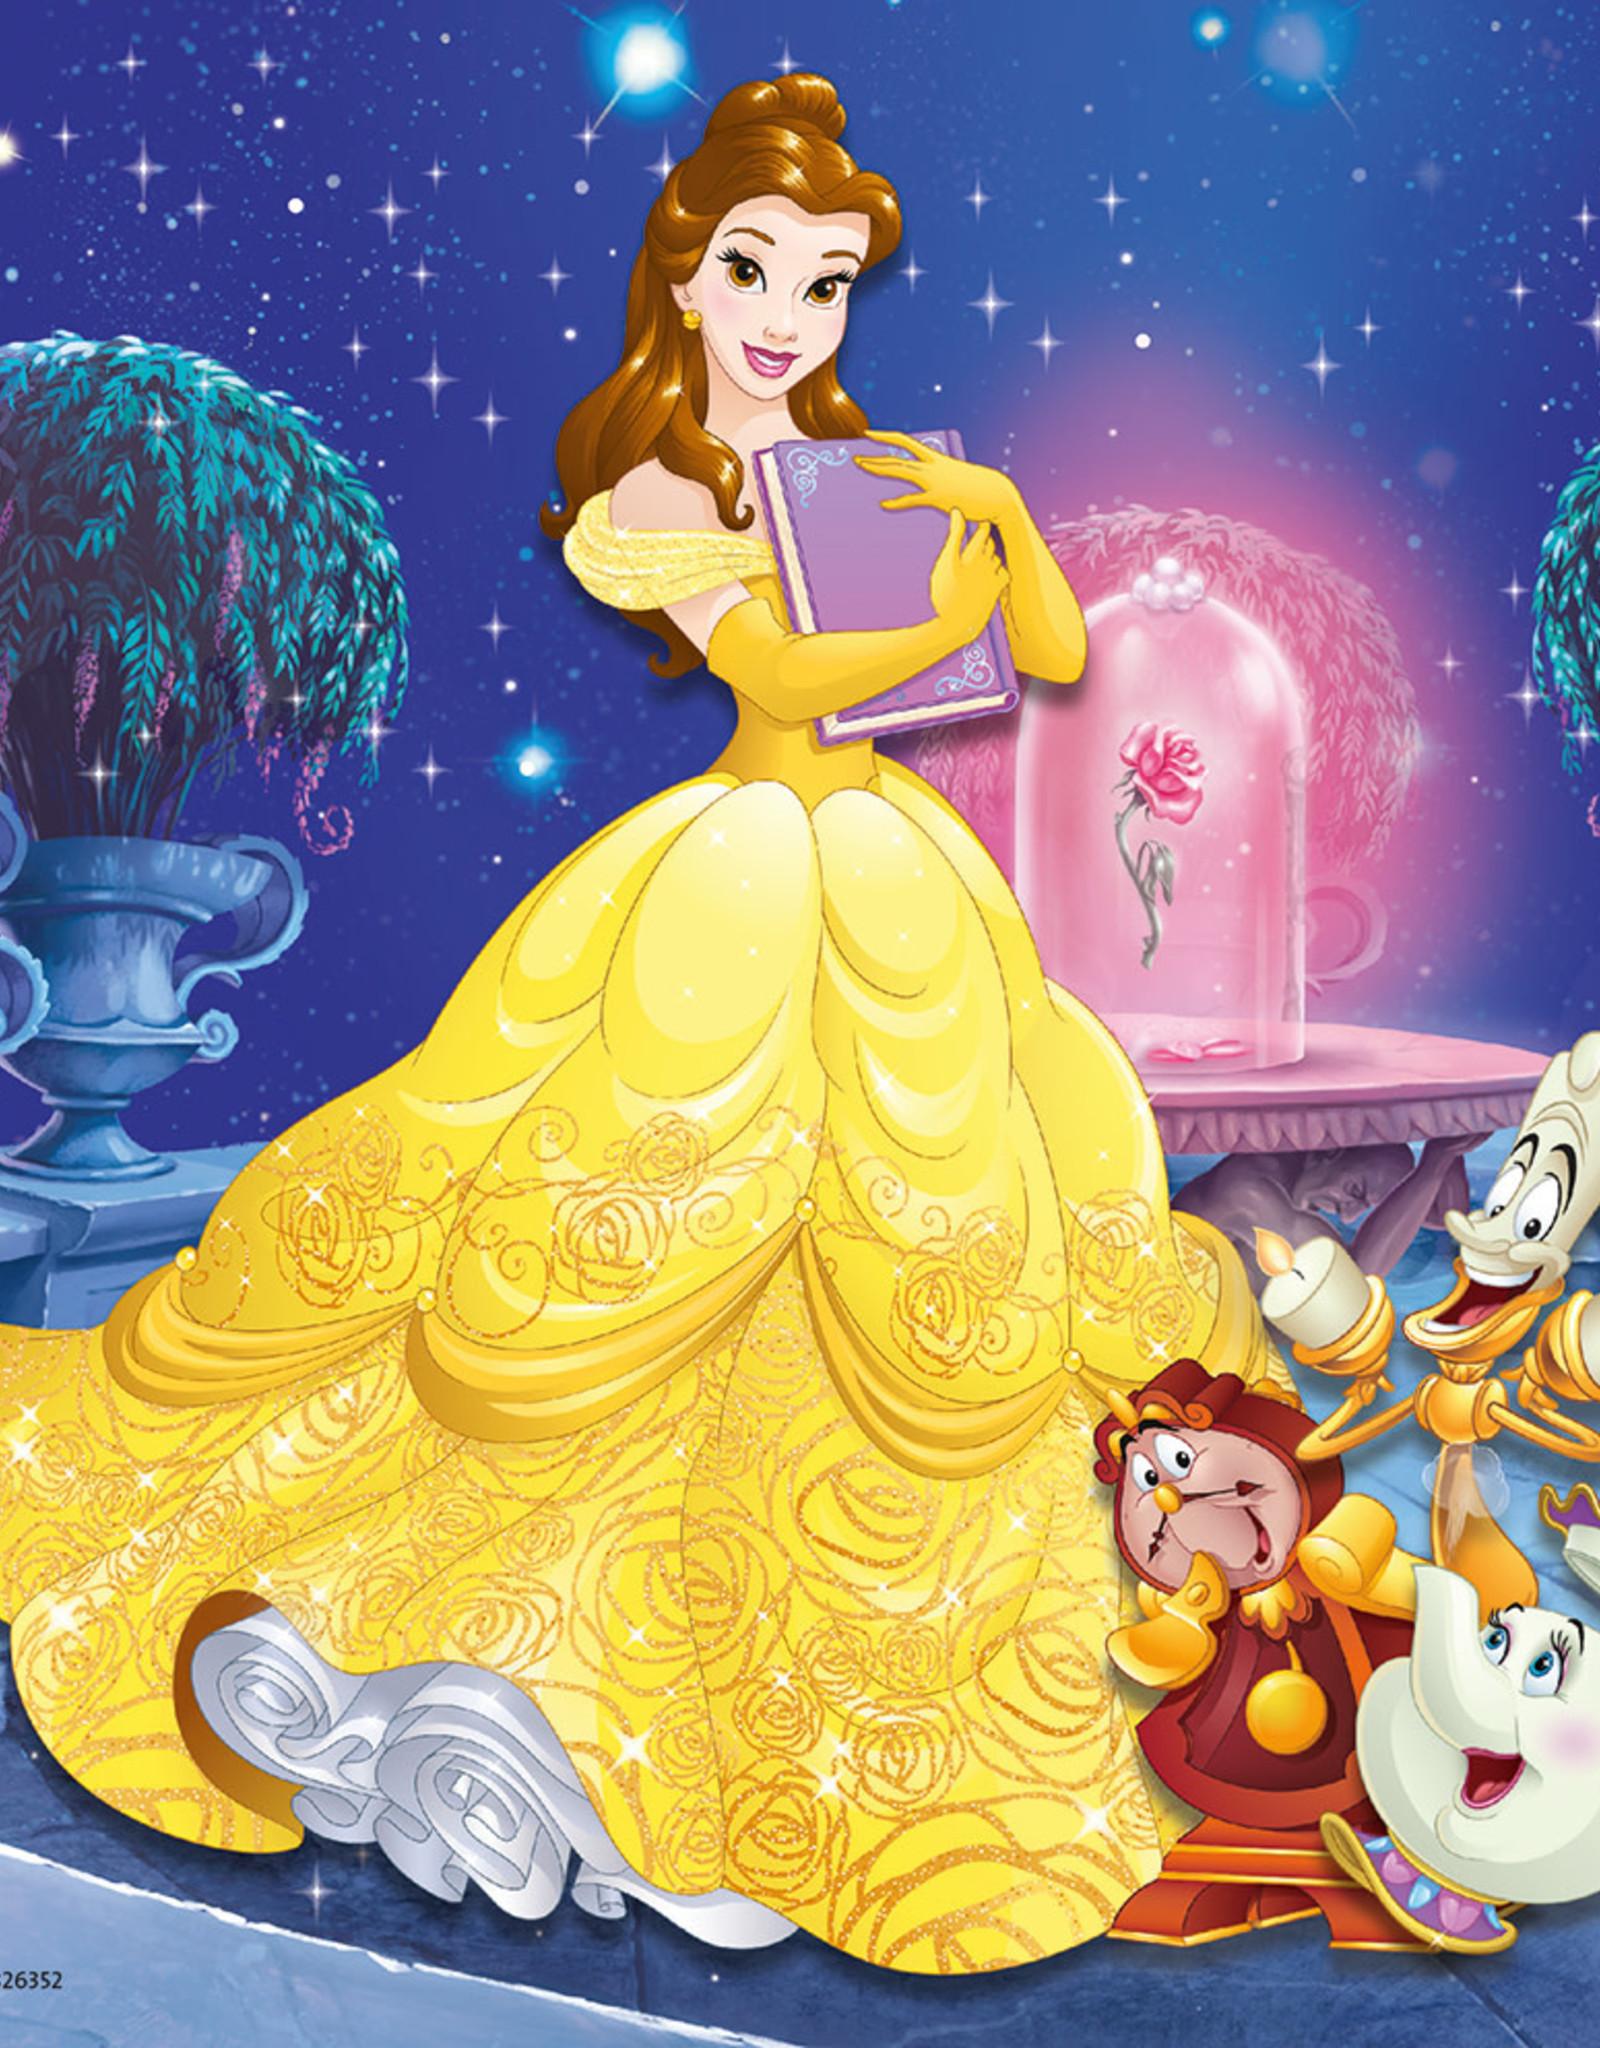 Ravensburger Princesses Adventure (3 x 49pc)